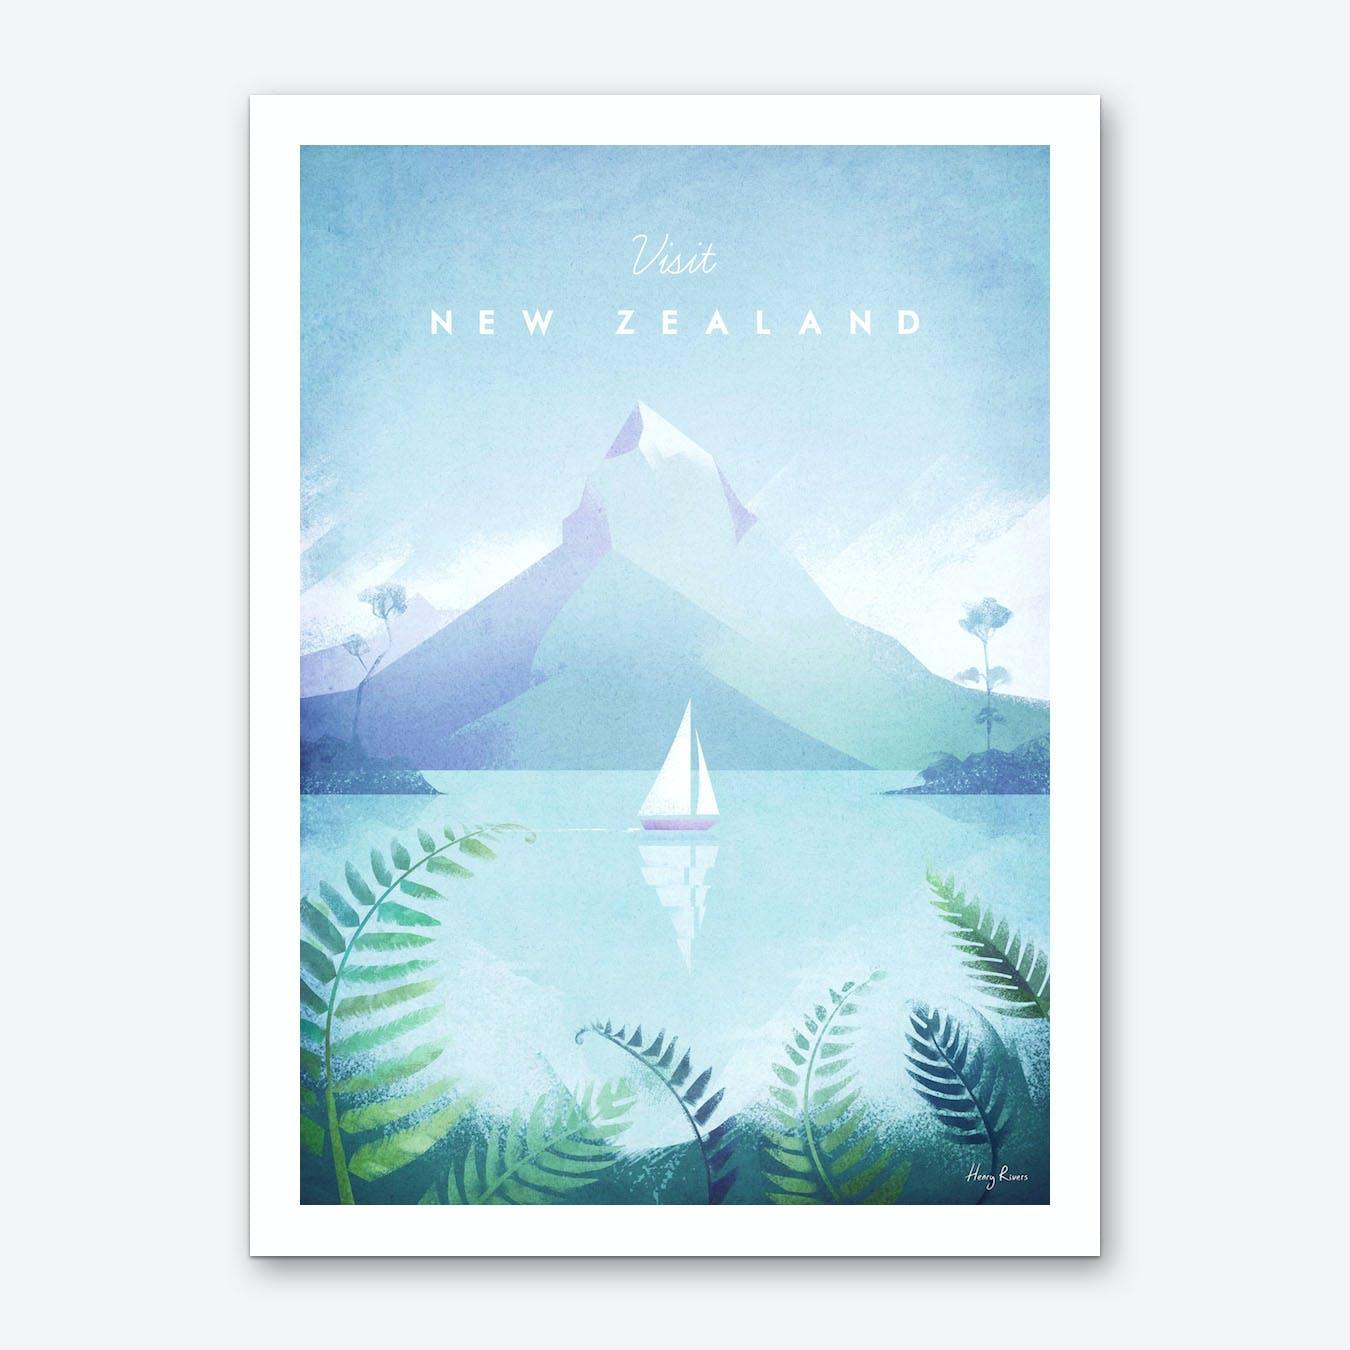 Visit New Zealand Art Print